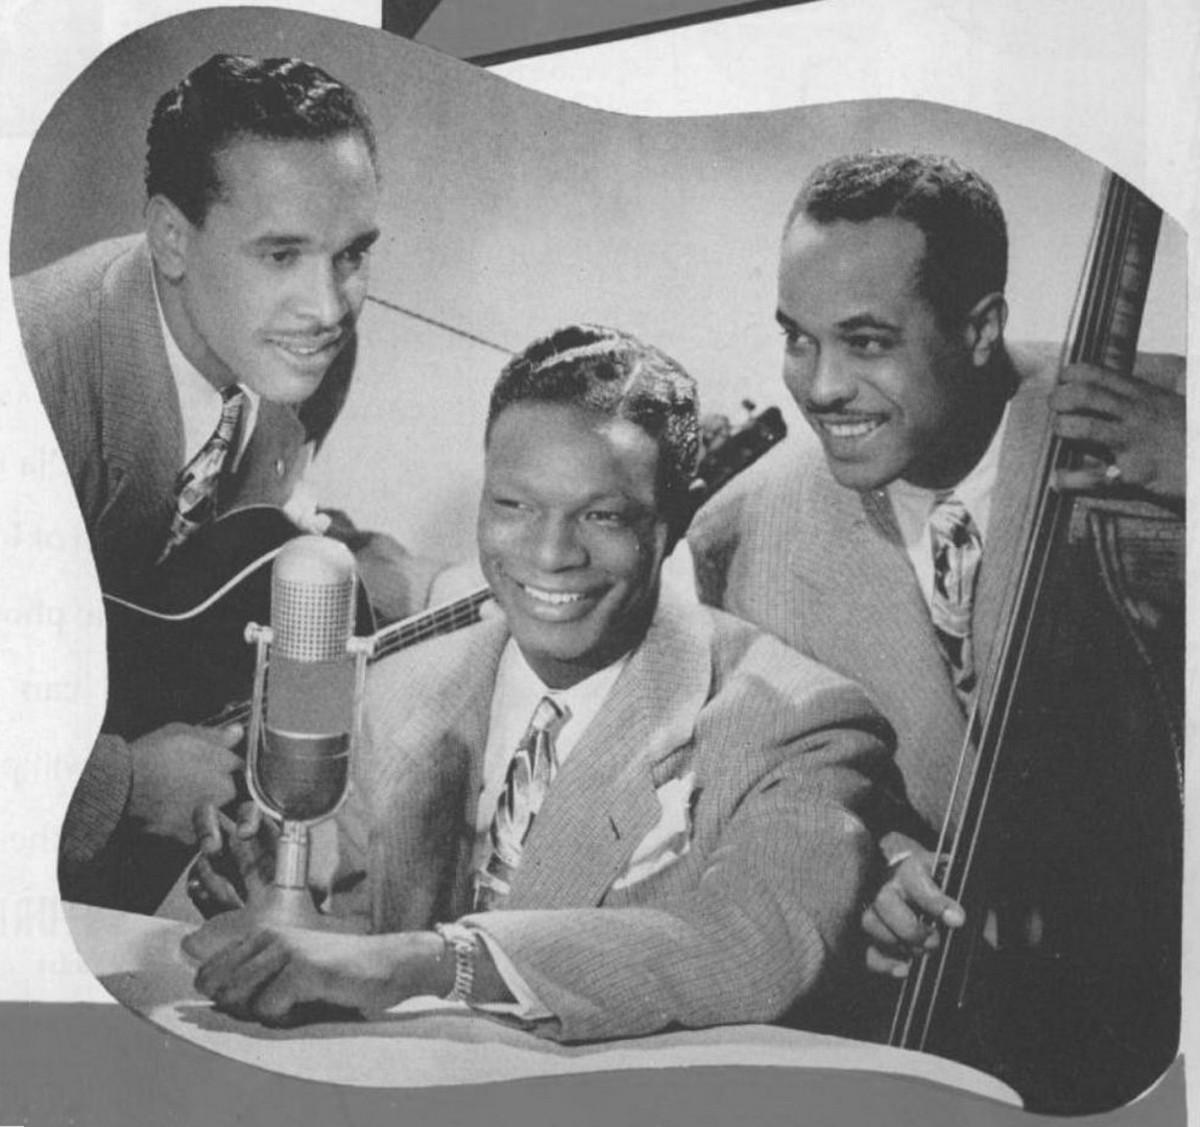 The King Cole Trio in 1944